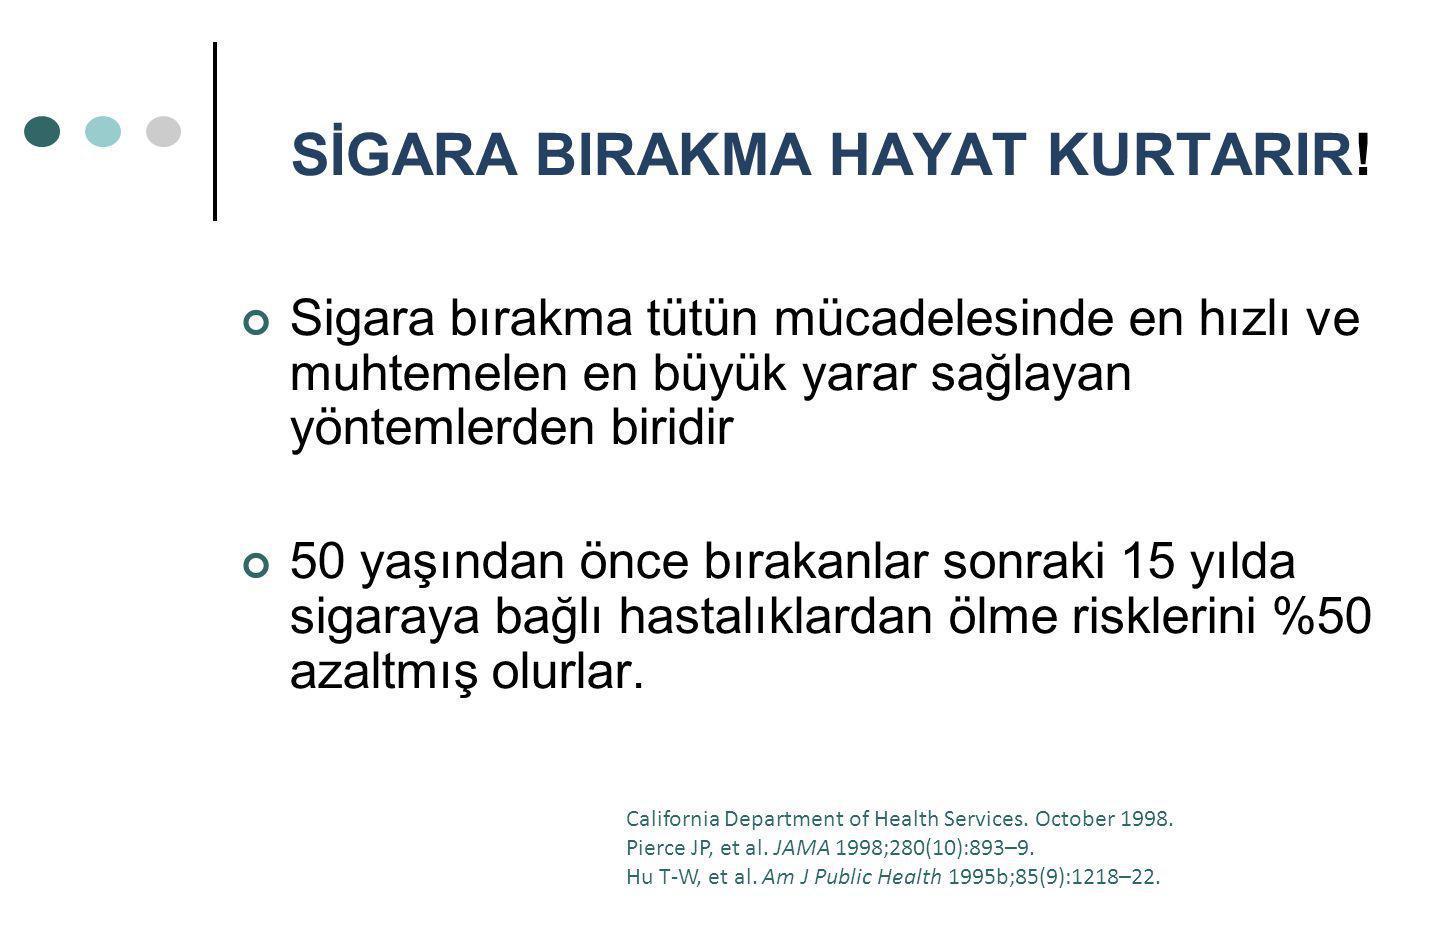 SİGARA BIRAKMA HAYAT KURTARIR!